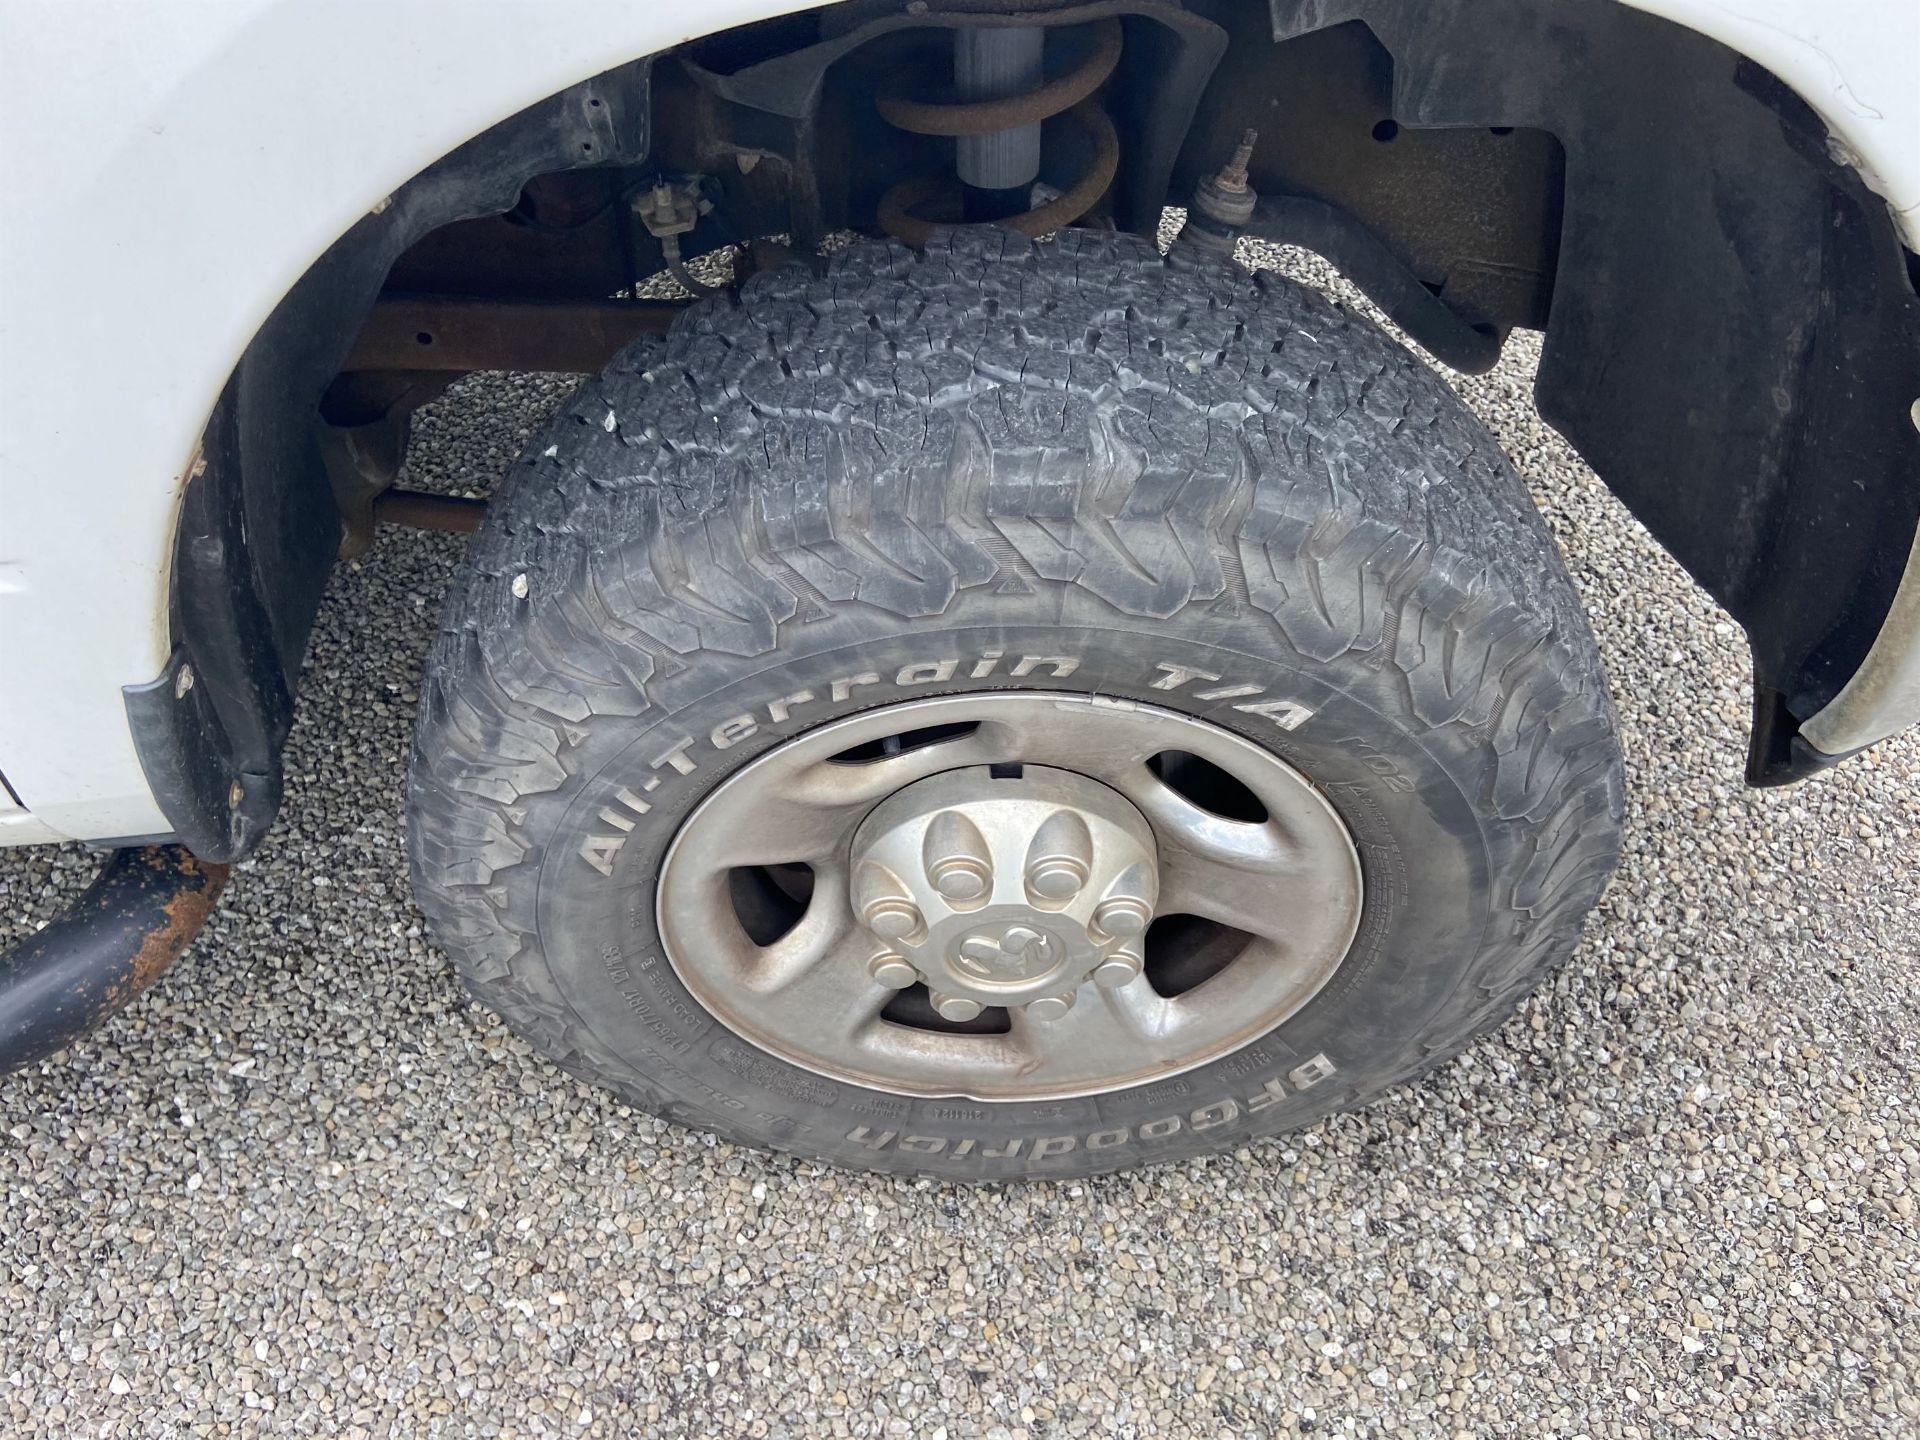 2011 Dodge Ram 2500 HD Crew Cab Long Bed, 212k Miles, Vinyl, 4x4, Gas, VIN # 3D7TT2CT9BG626009 - Image 7 of 16